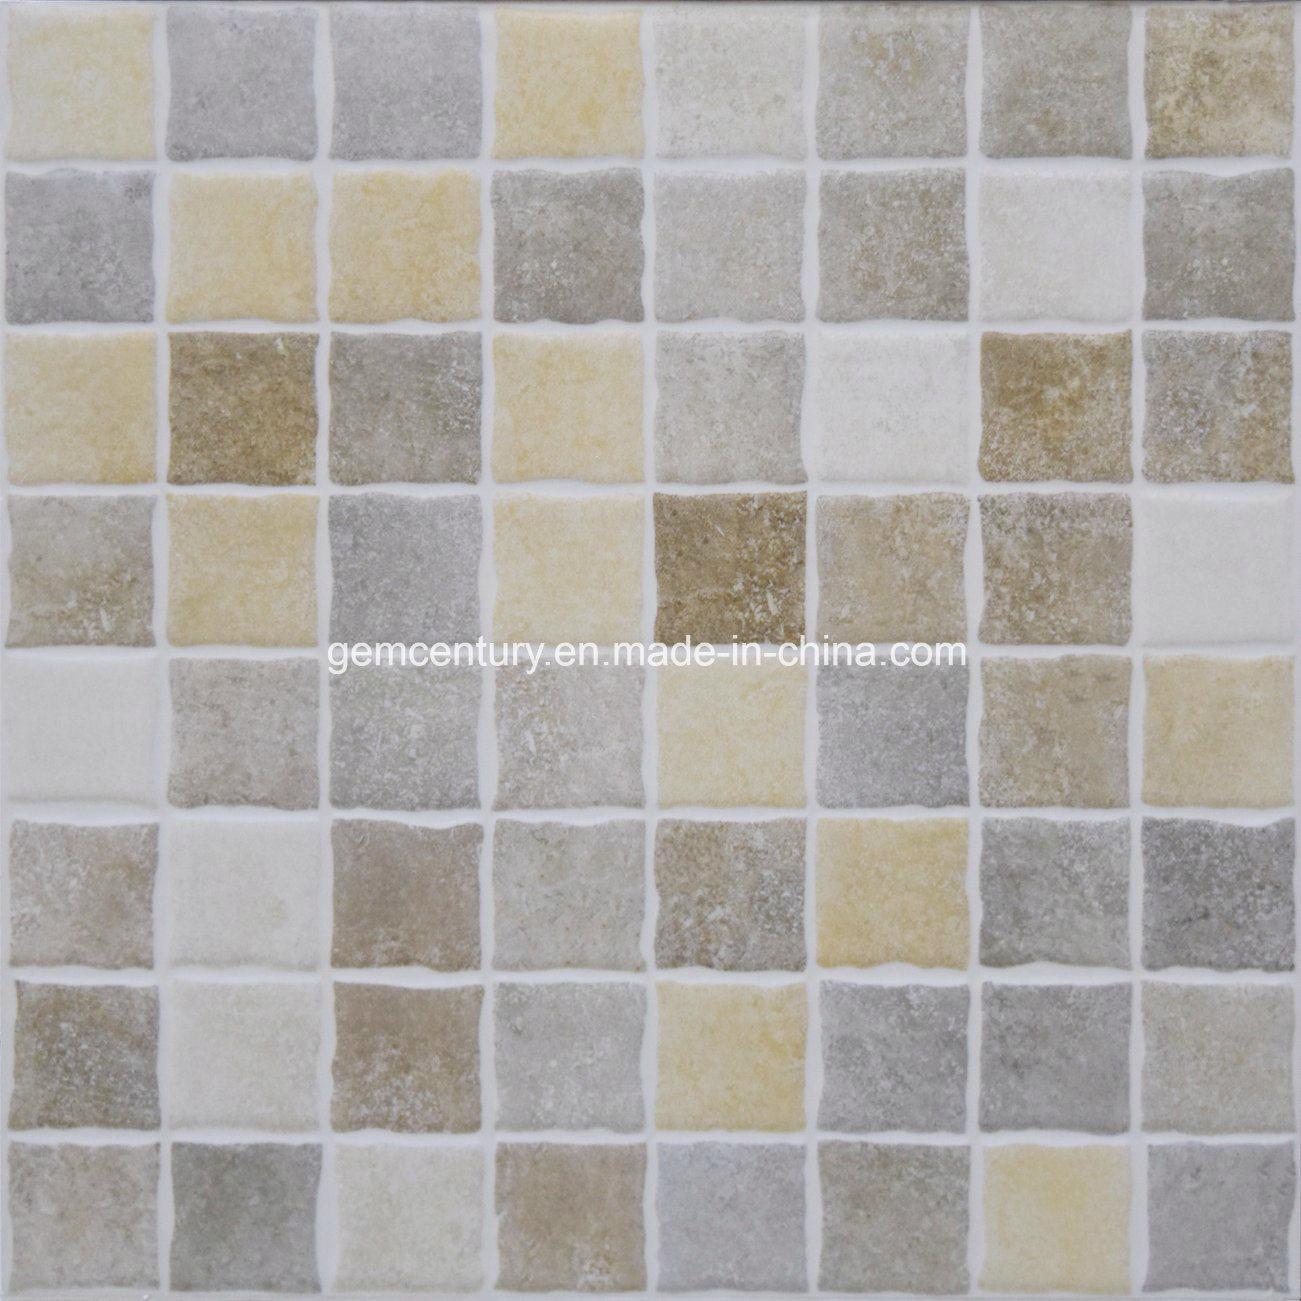 China Rustic Wall Ceramic Tiles 30x30 China Ceramic Tile Wall Tiles